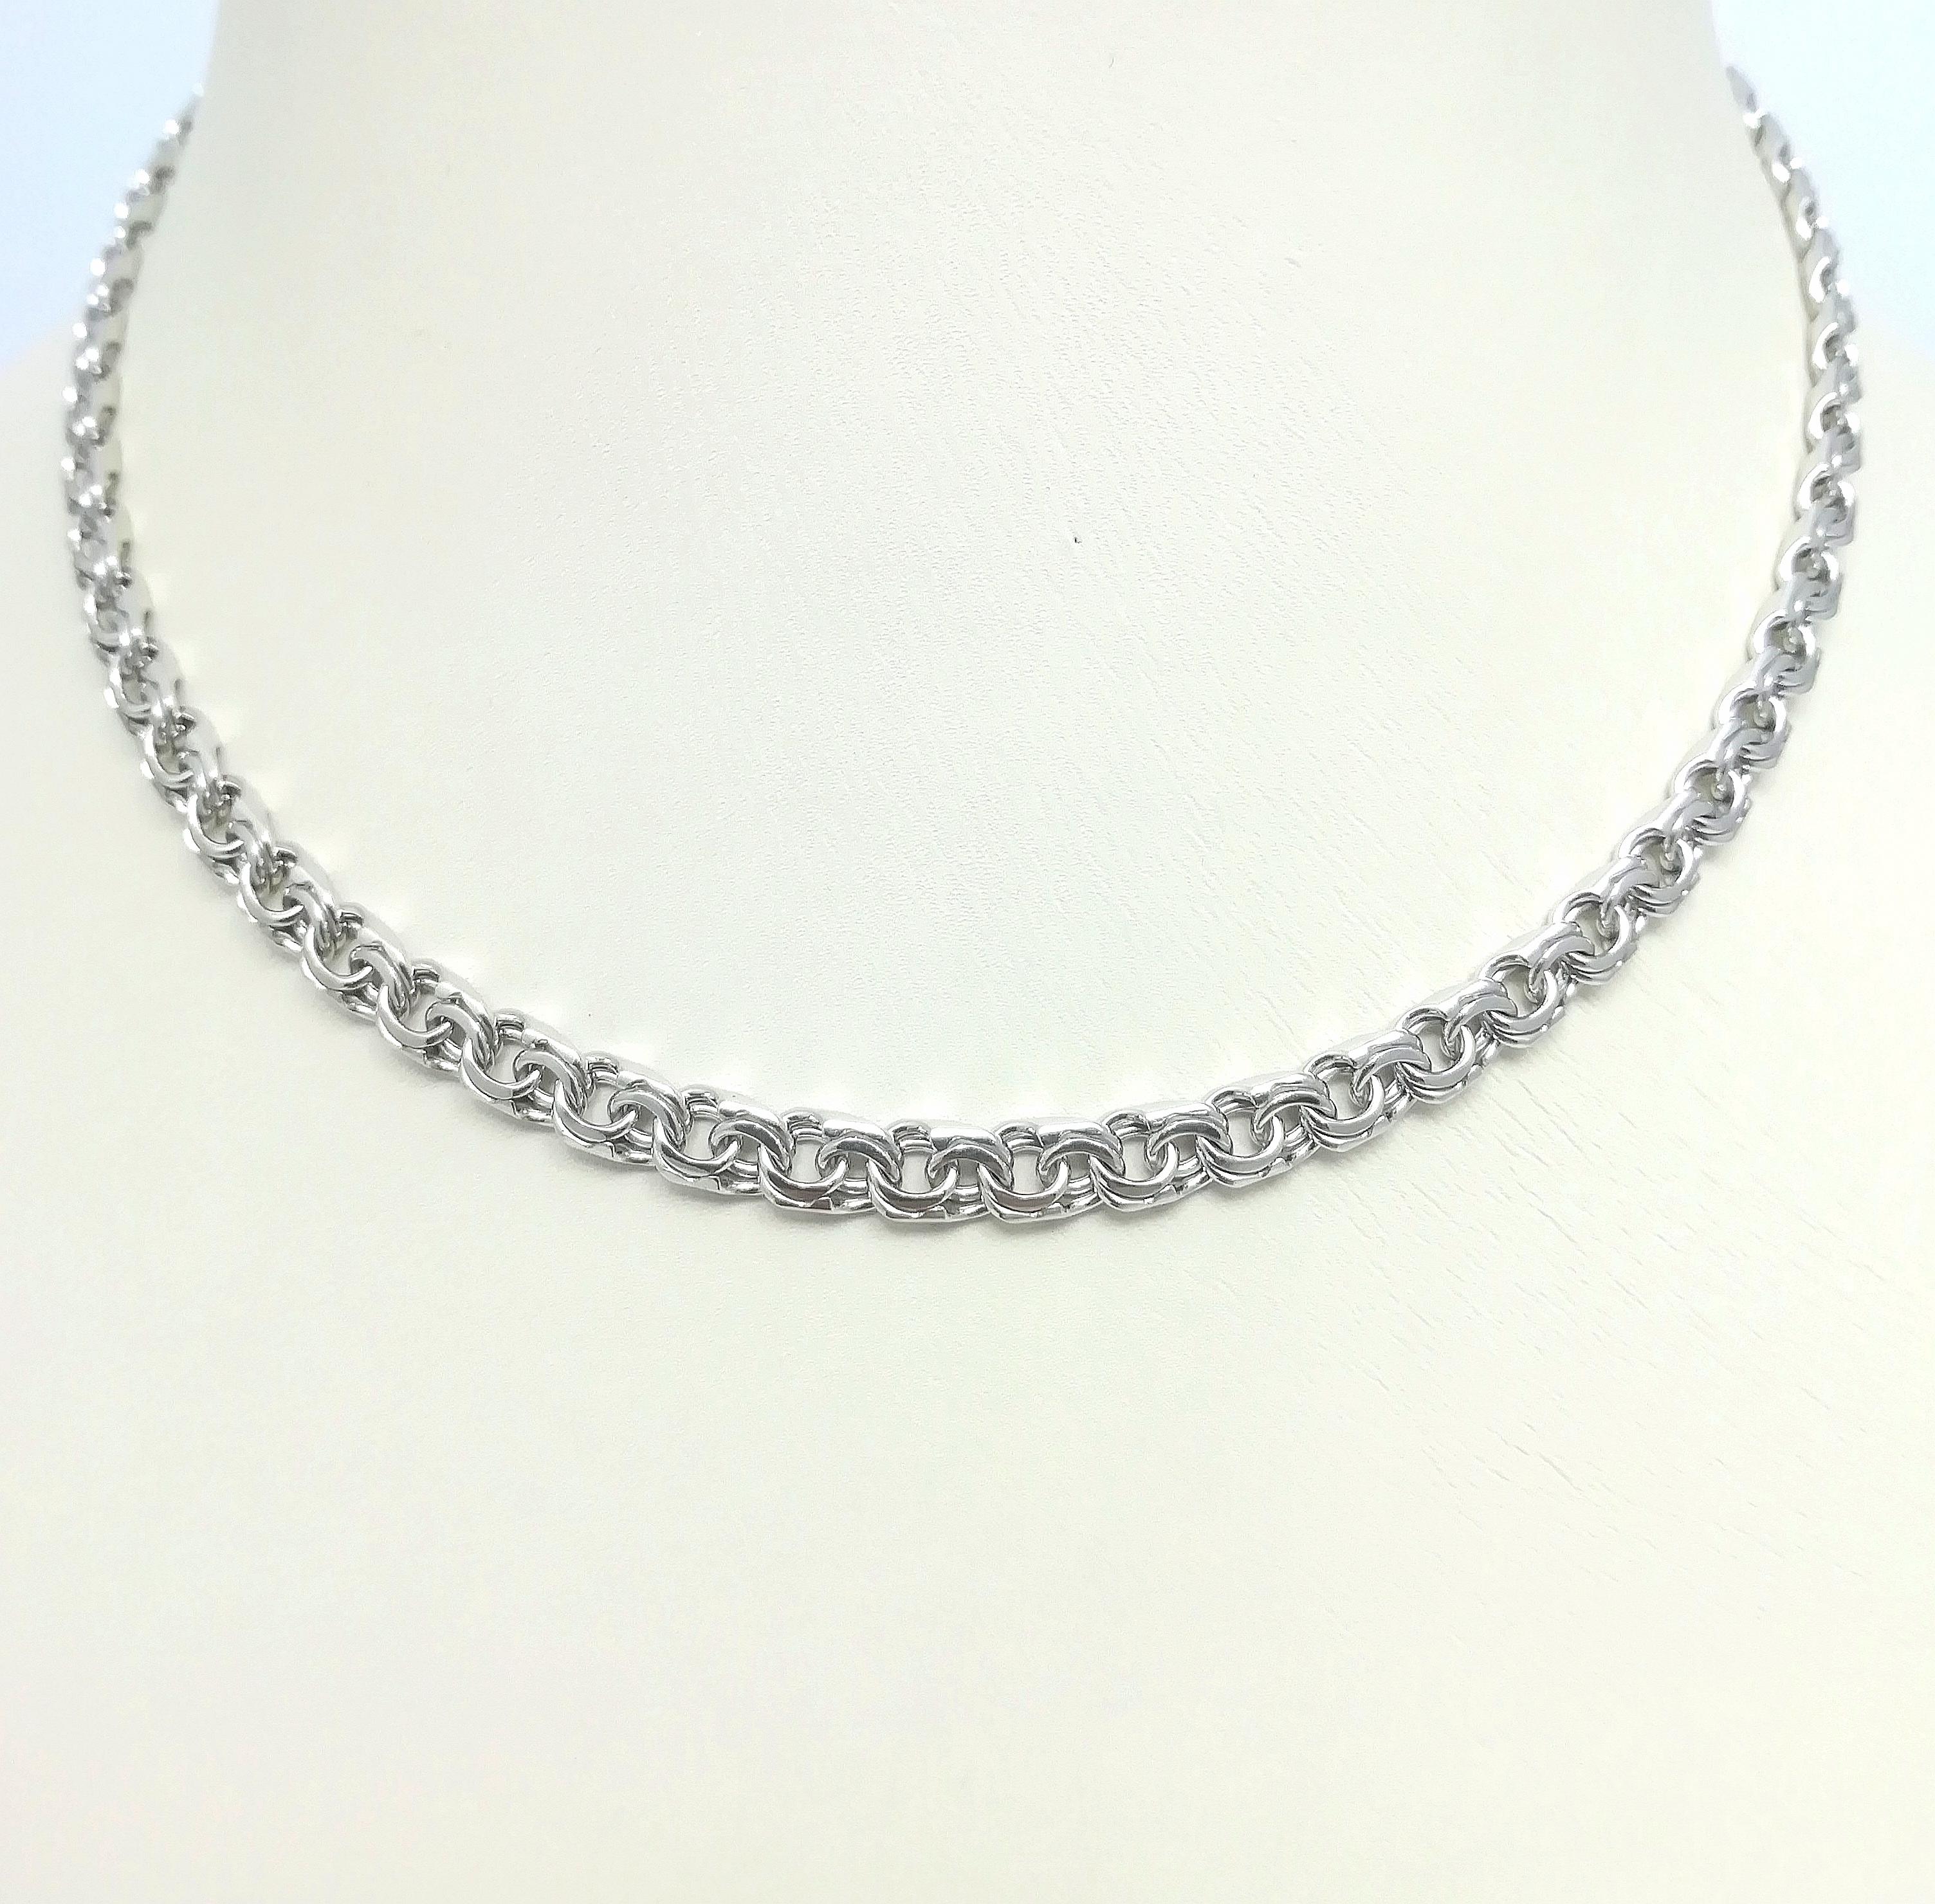 Серебро цепь дк240920-117 23,60гр